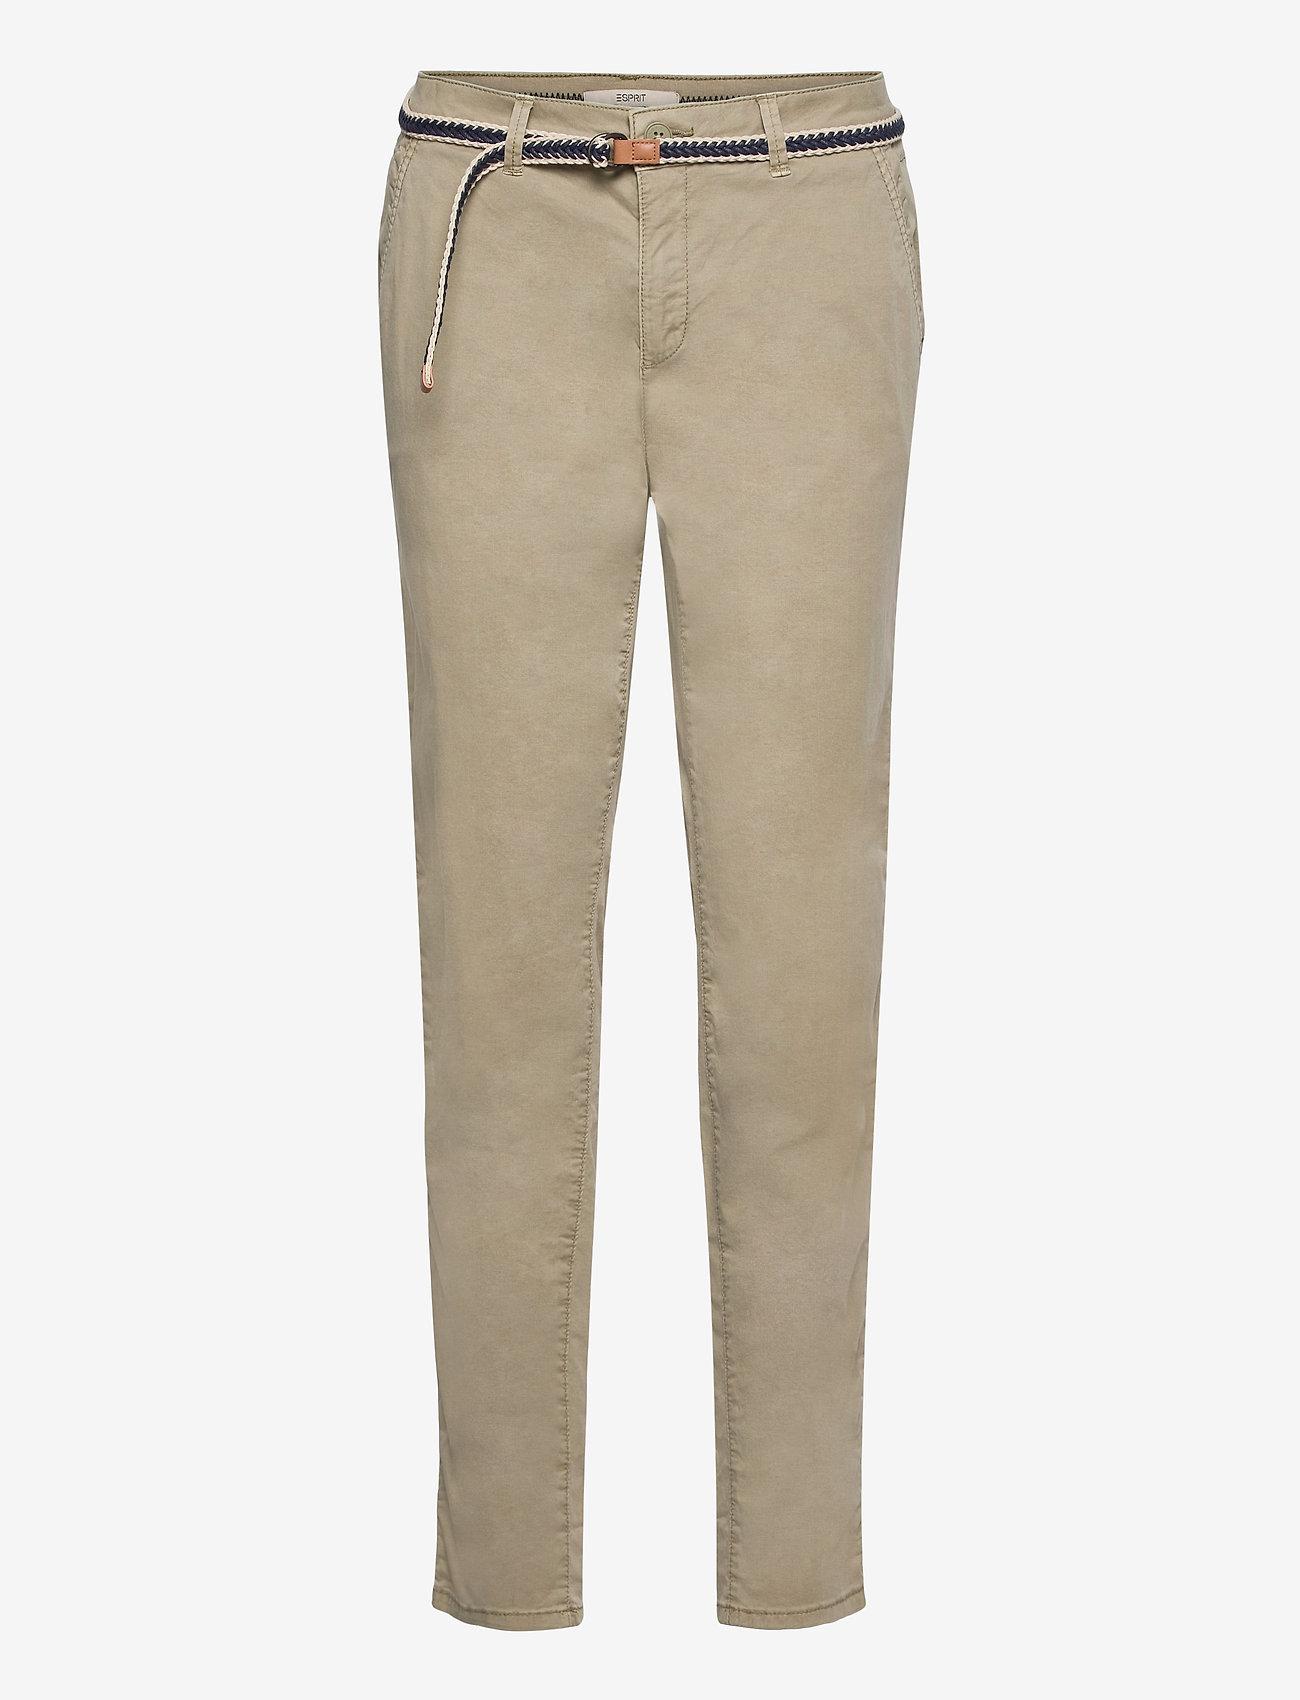 Esprit Casual - Pants woven - chinos - pale khaki - 0